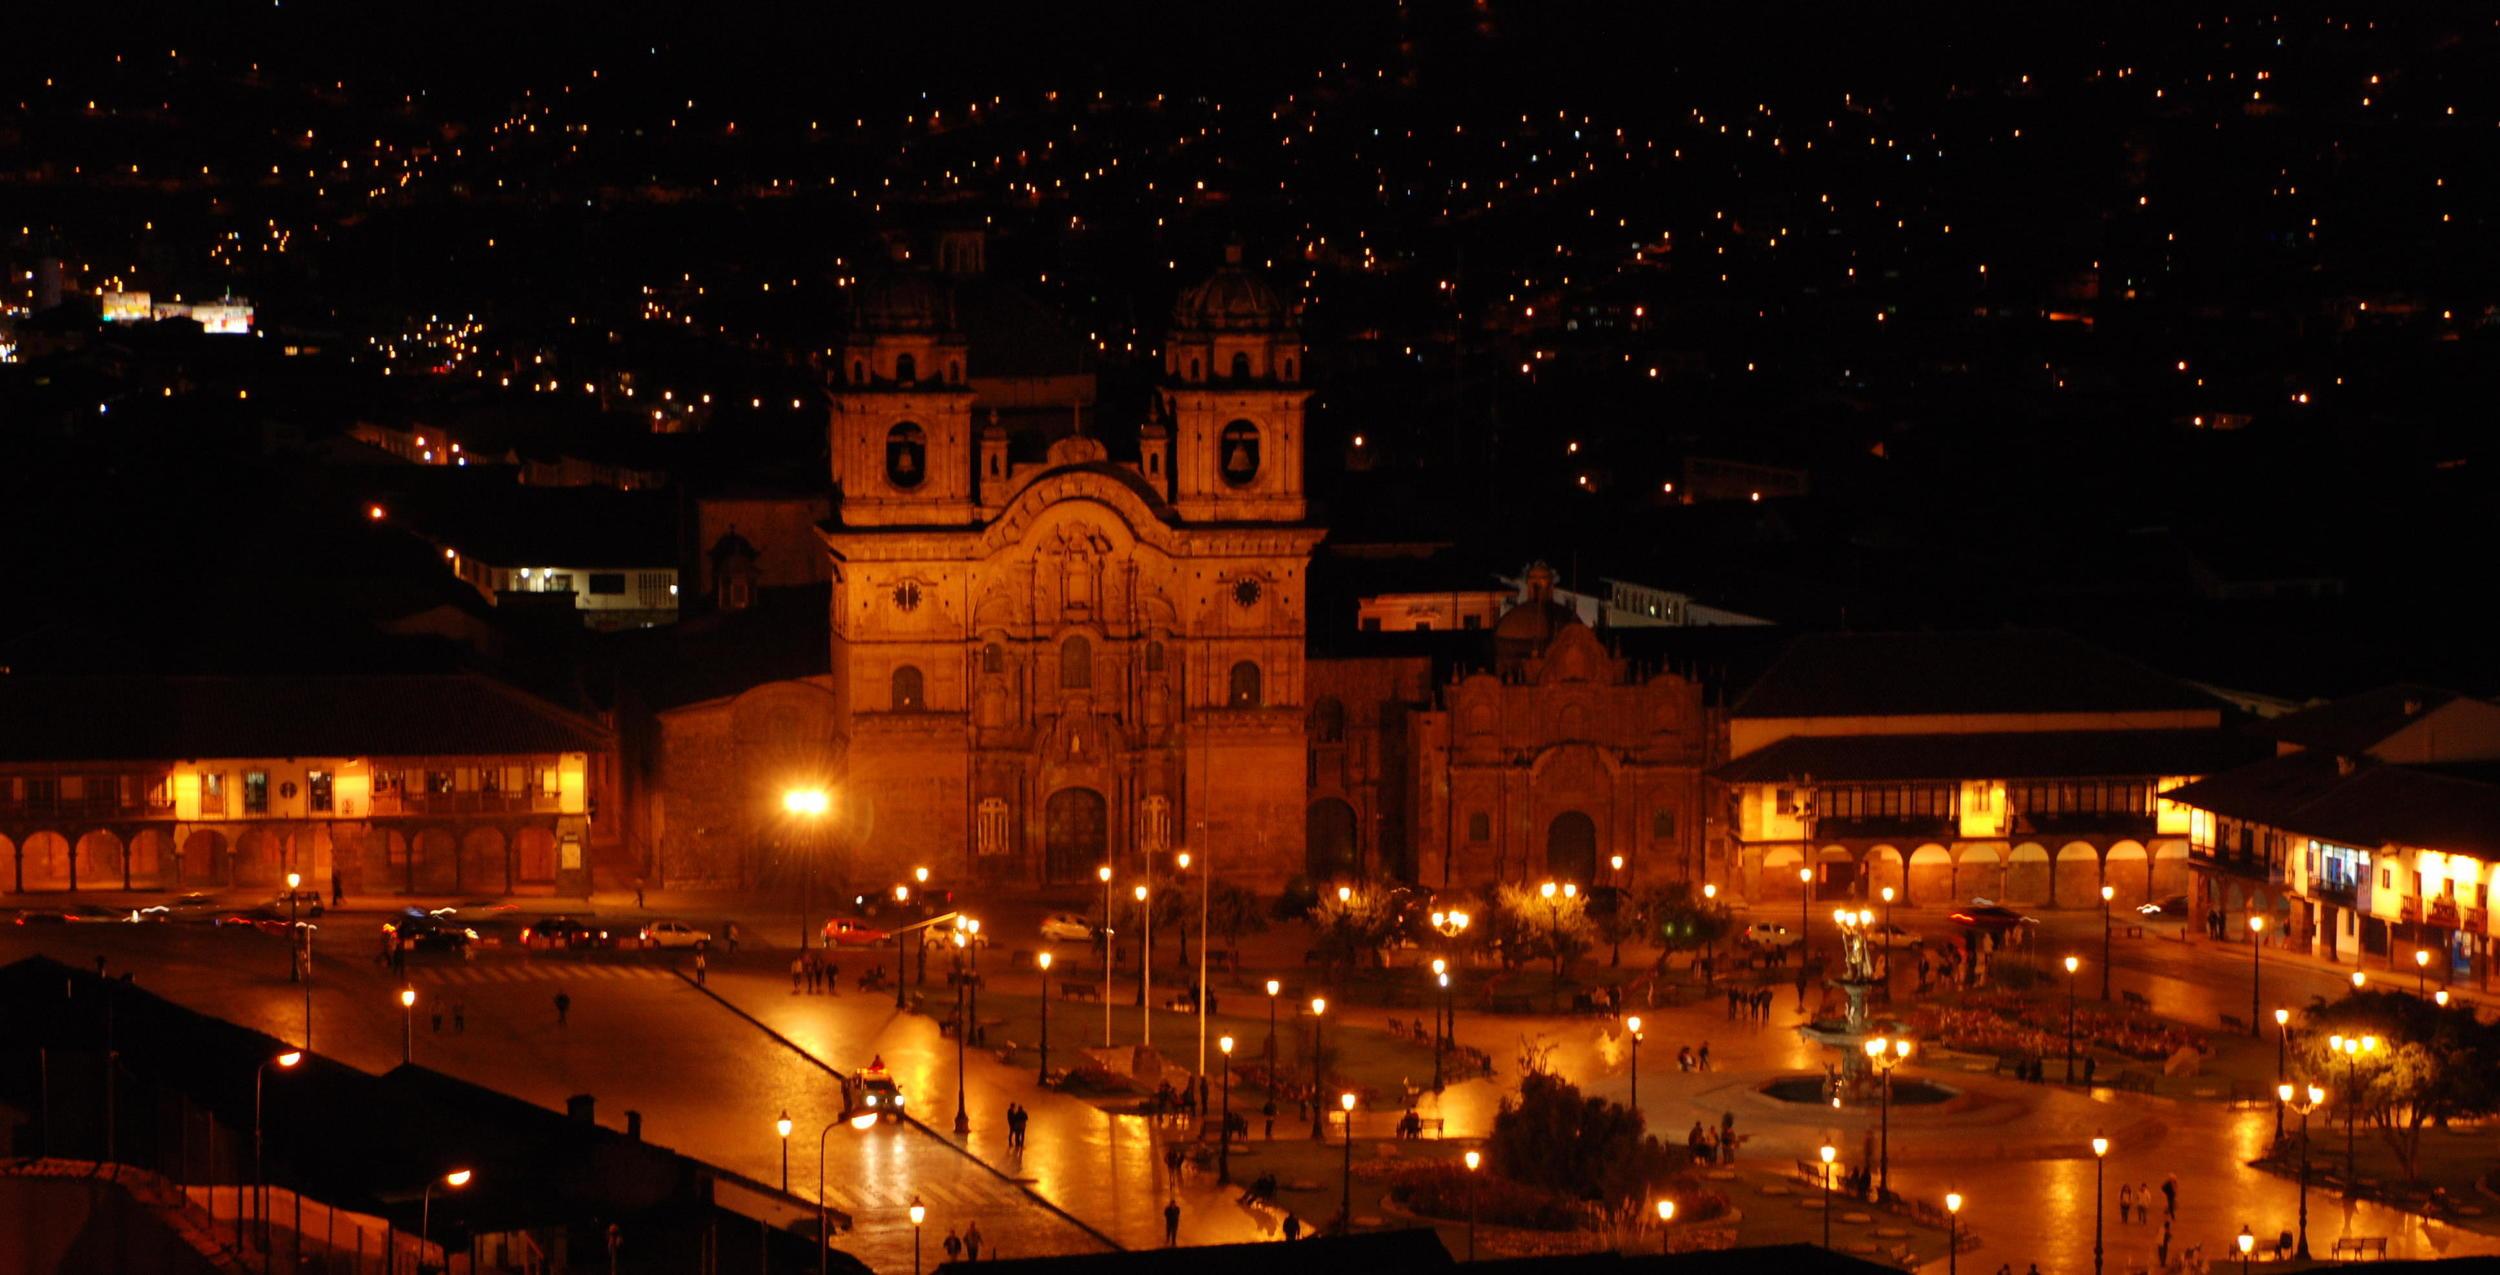 Muistne pealinn Cusco. Foto: Krista Klein